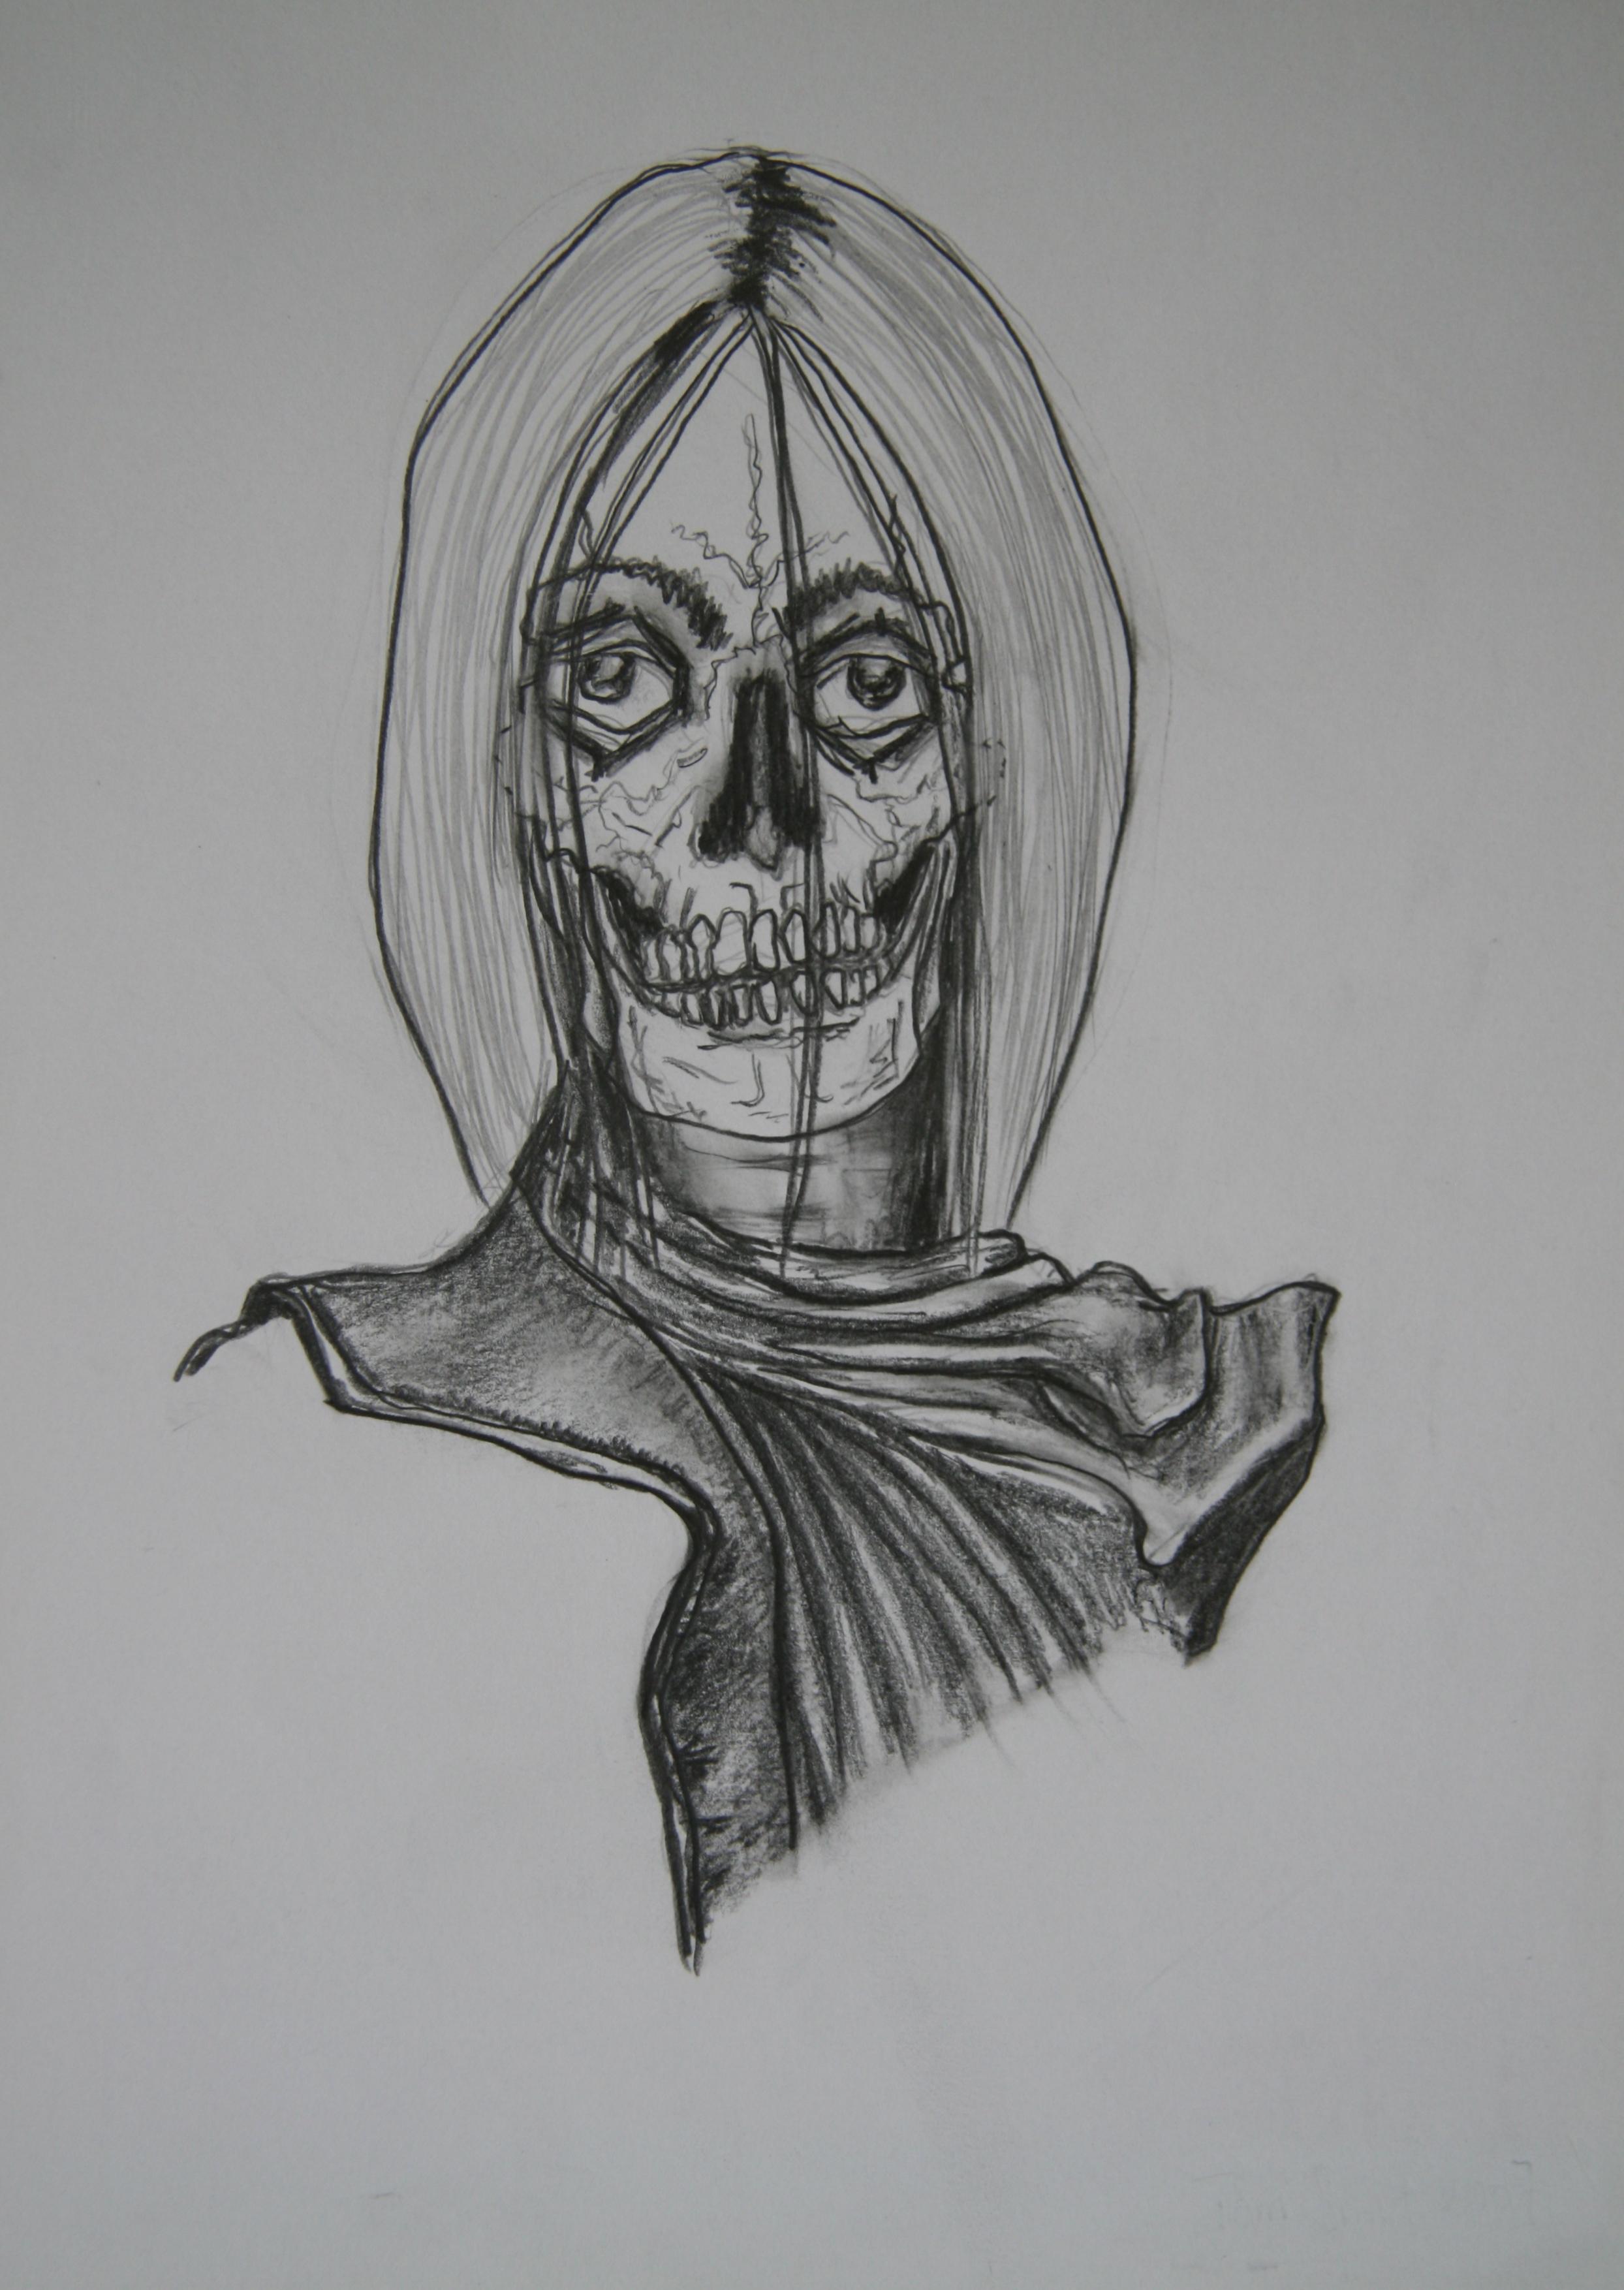 Skull 7, 30x21cm, pencil on paper